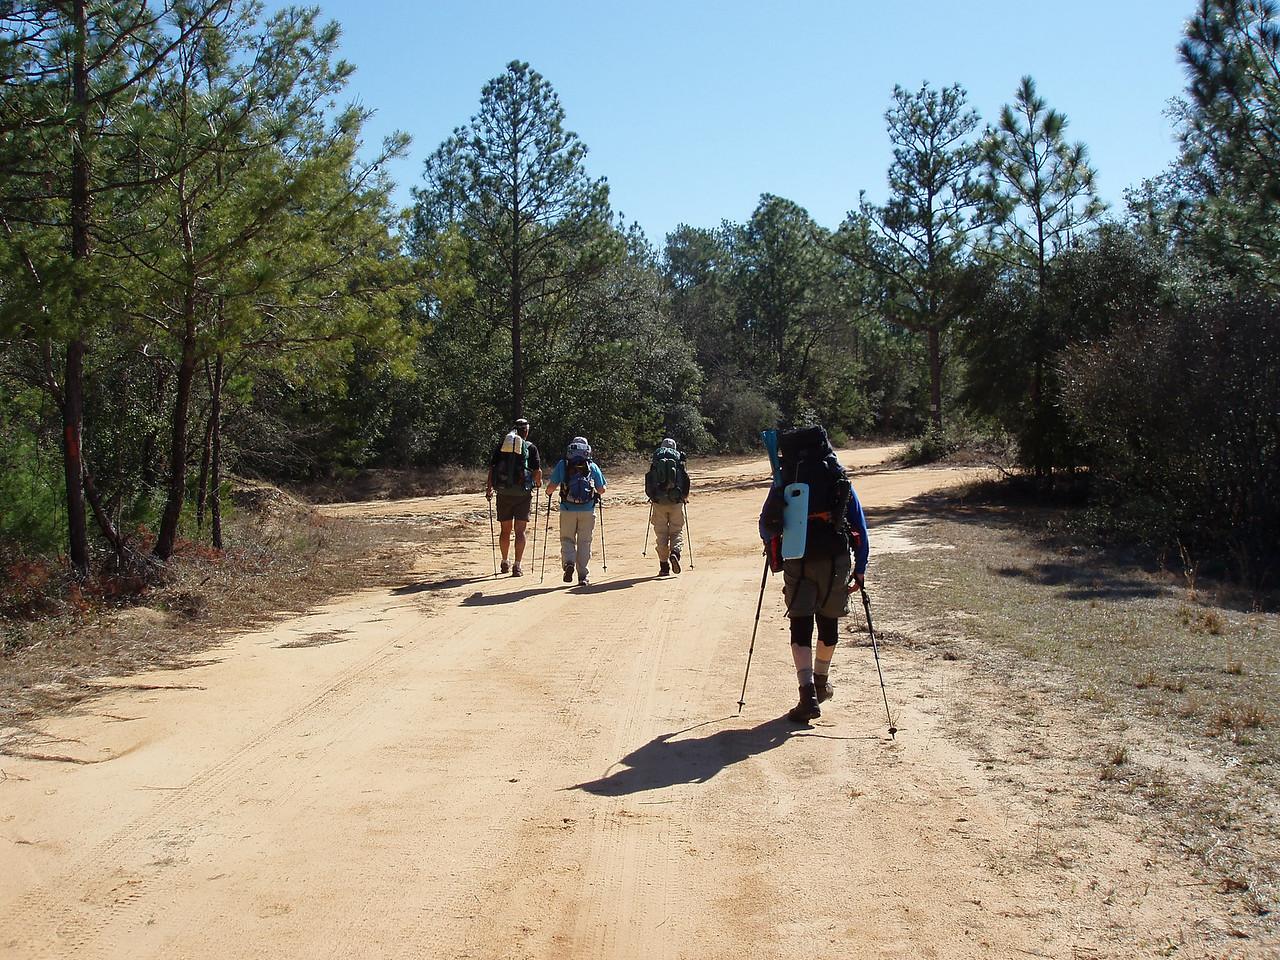 Backroads hiking in Eglin AFB<br /> PHOTO CREDIT: Robert Coveney / Florida Trail Association